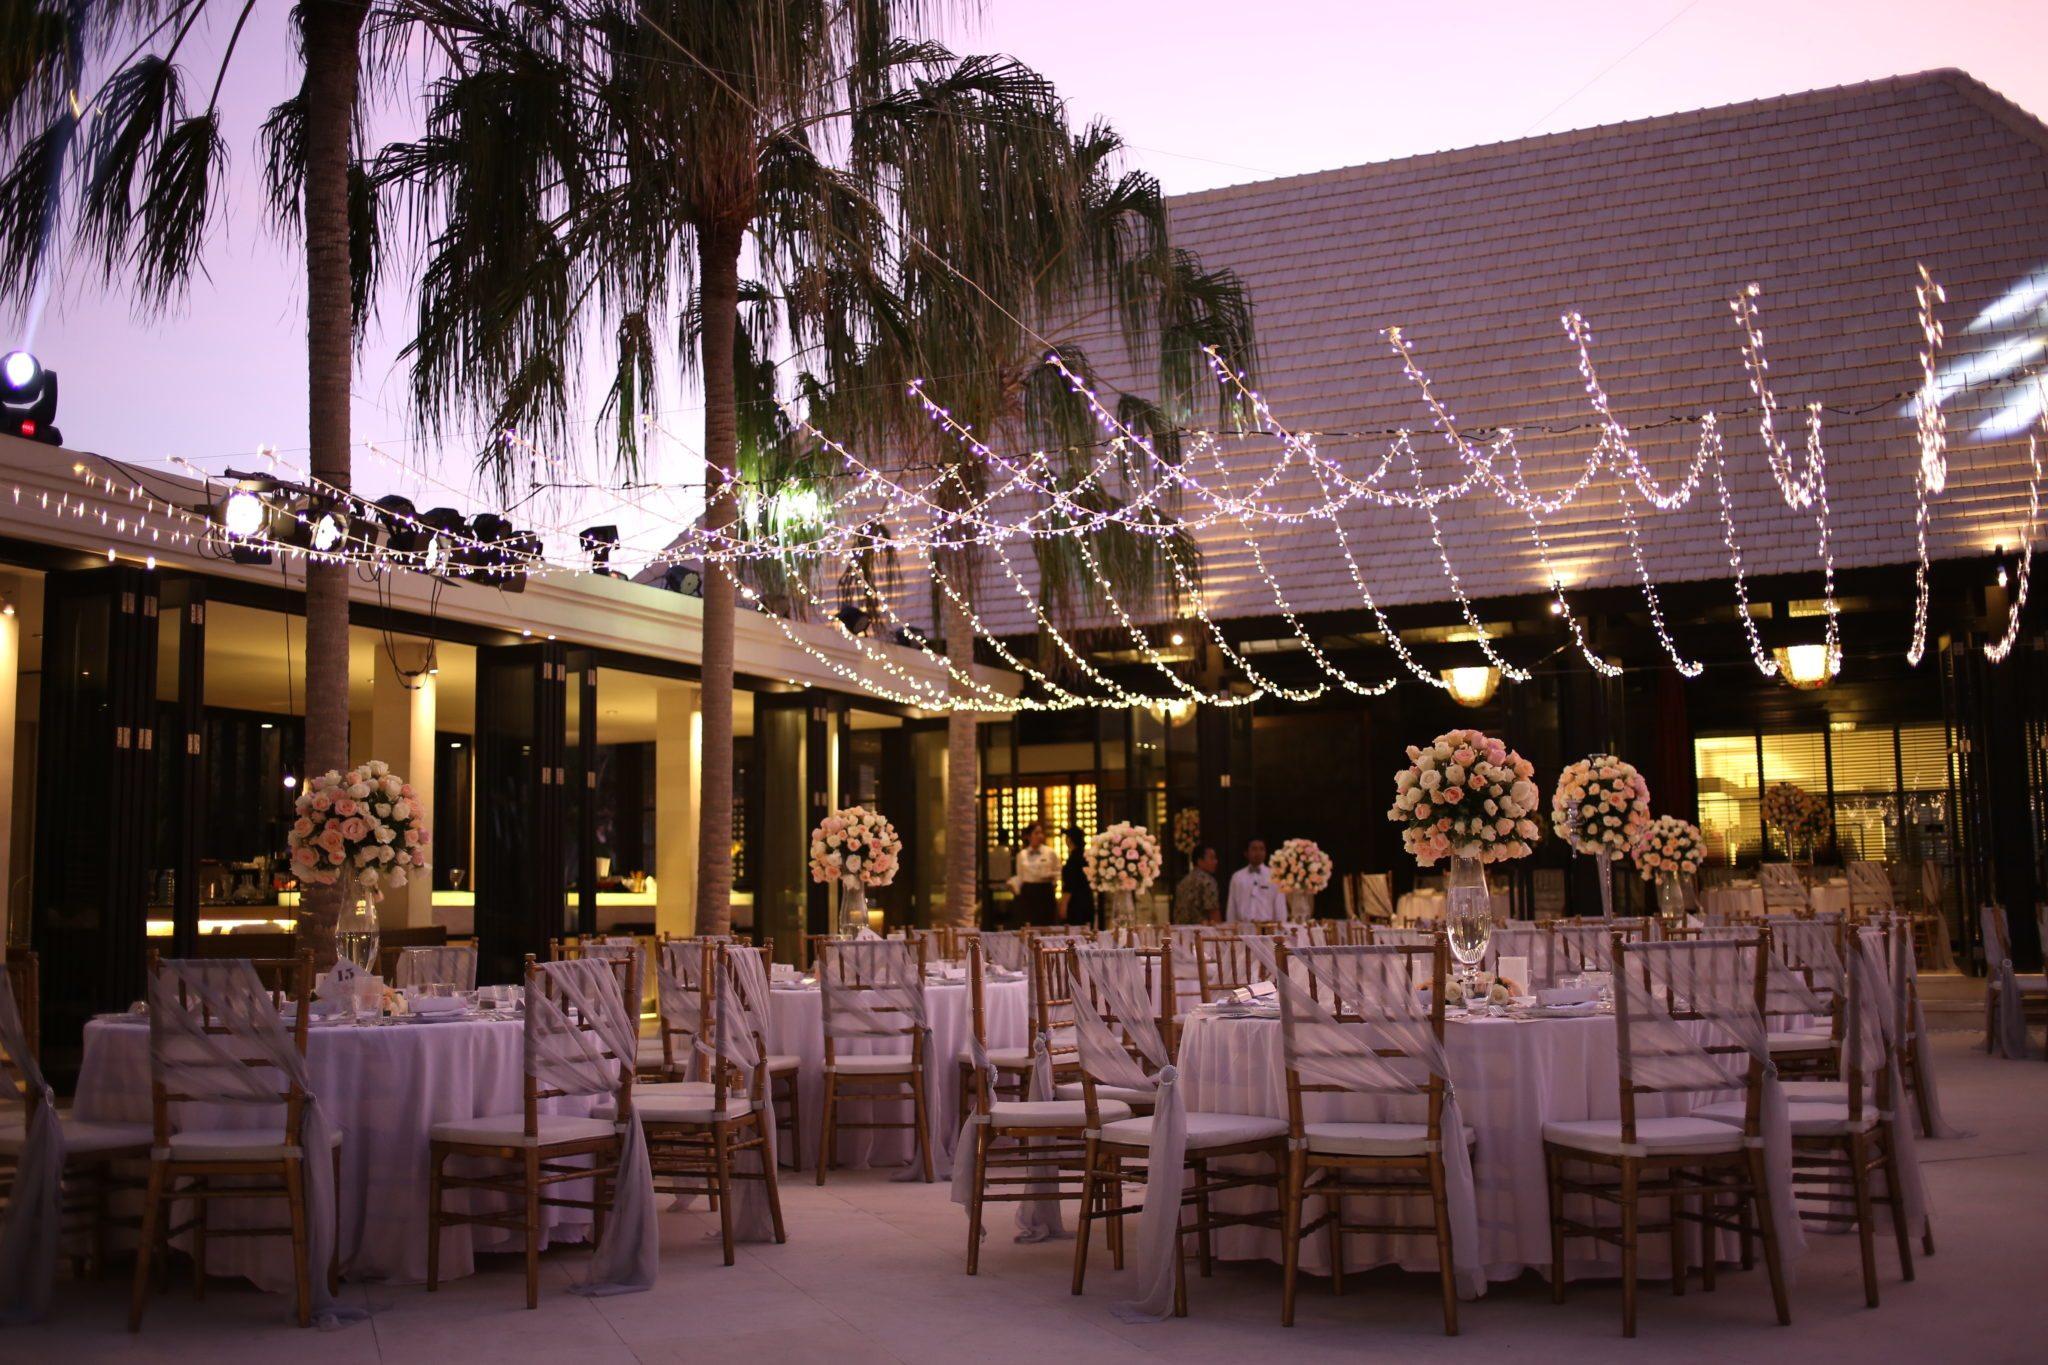 stellar wedding | butterfly event styling